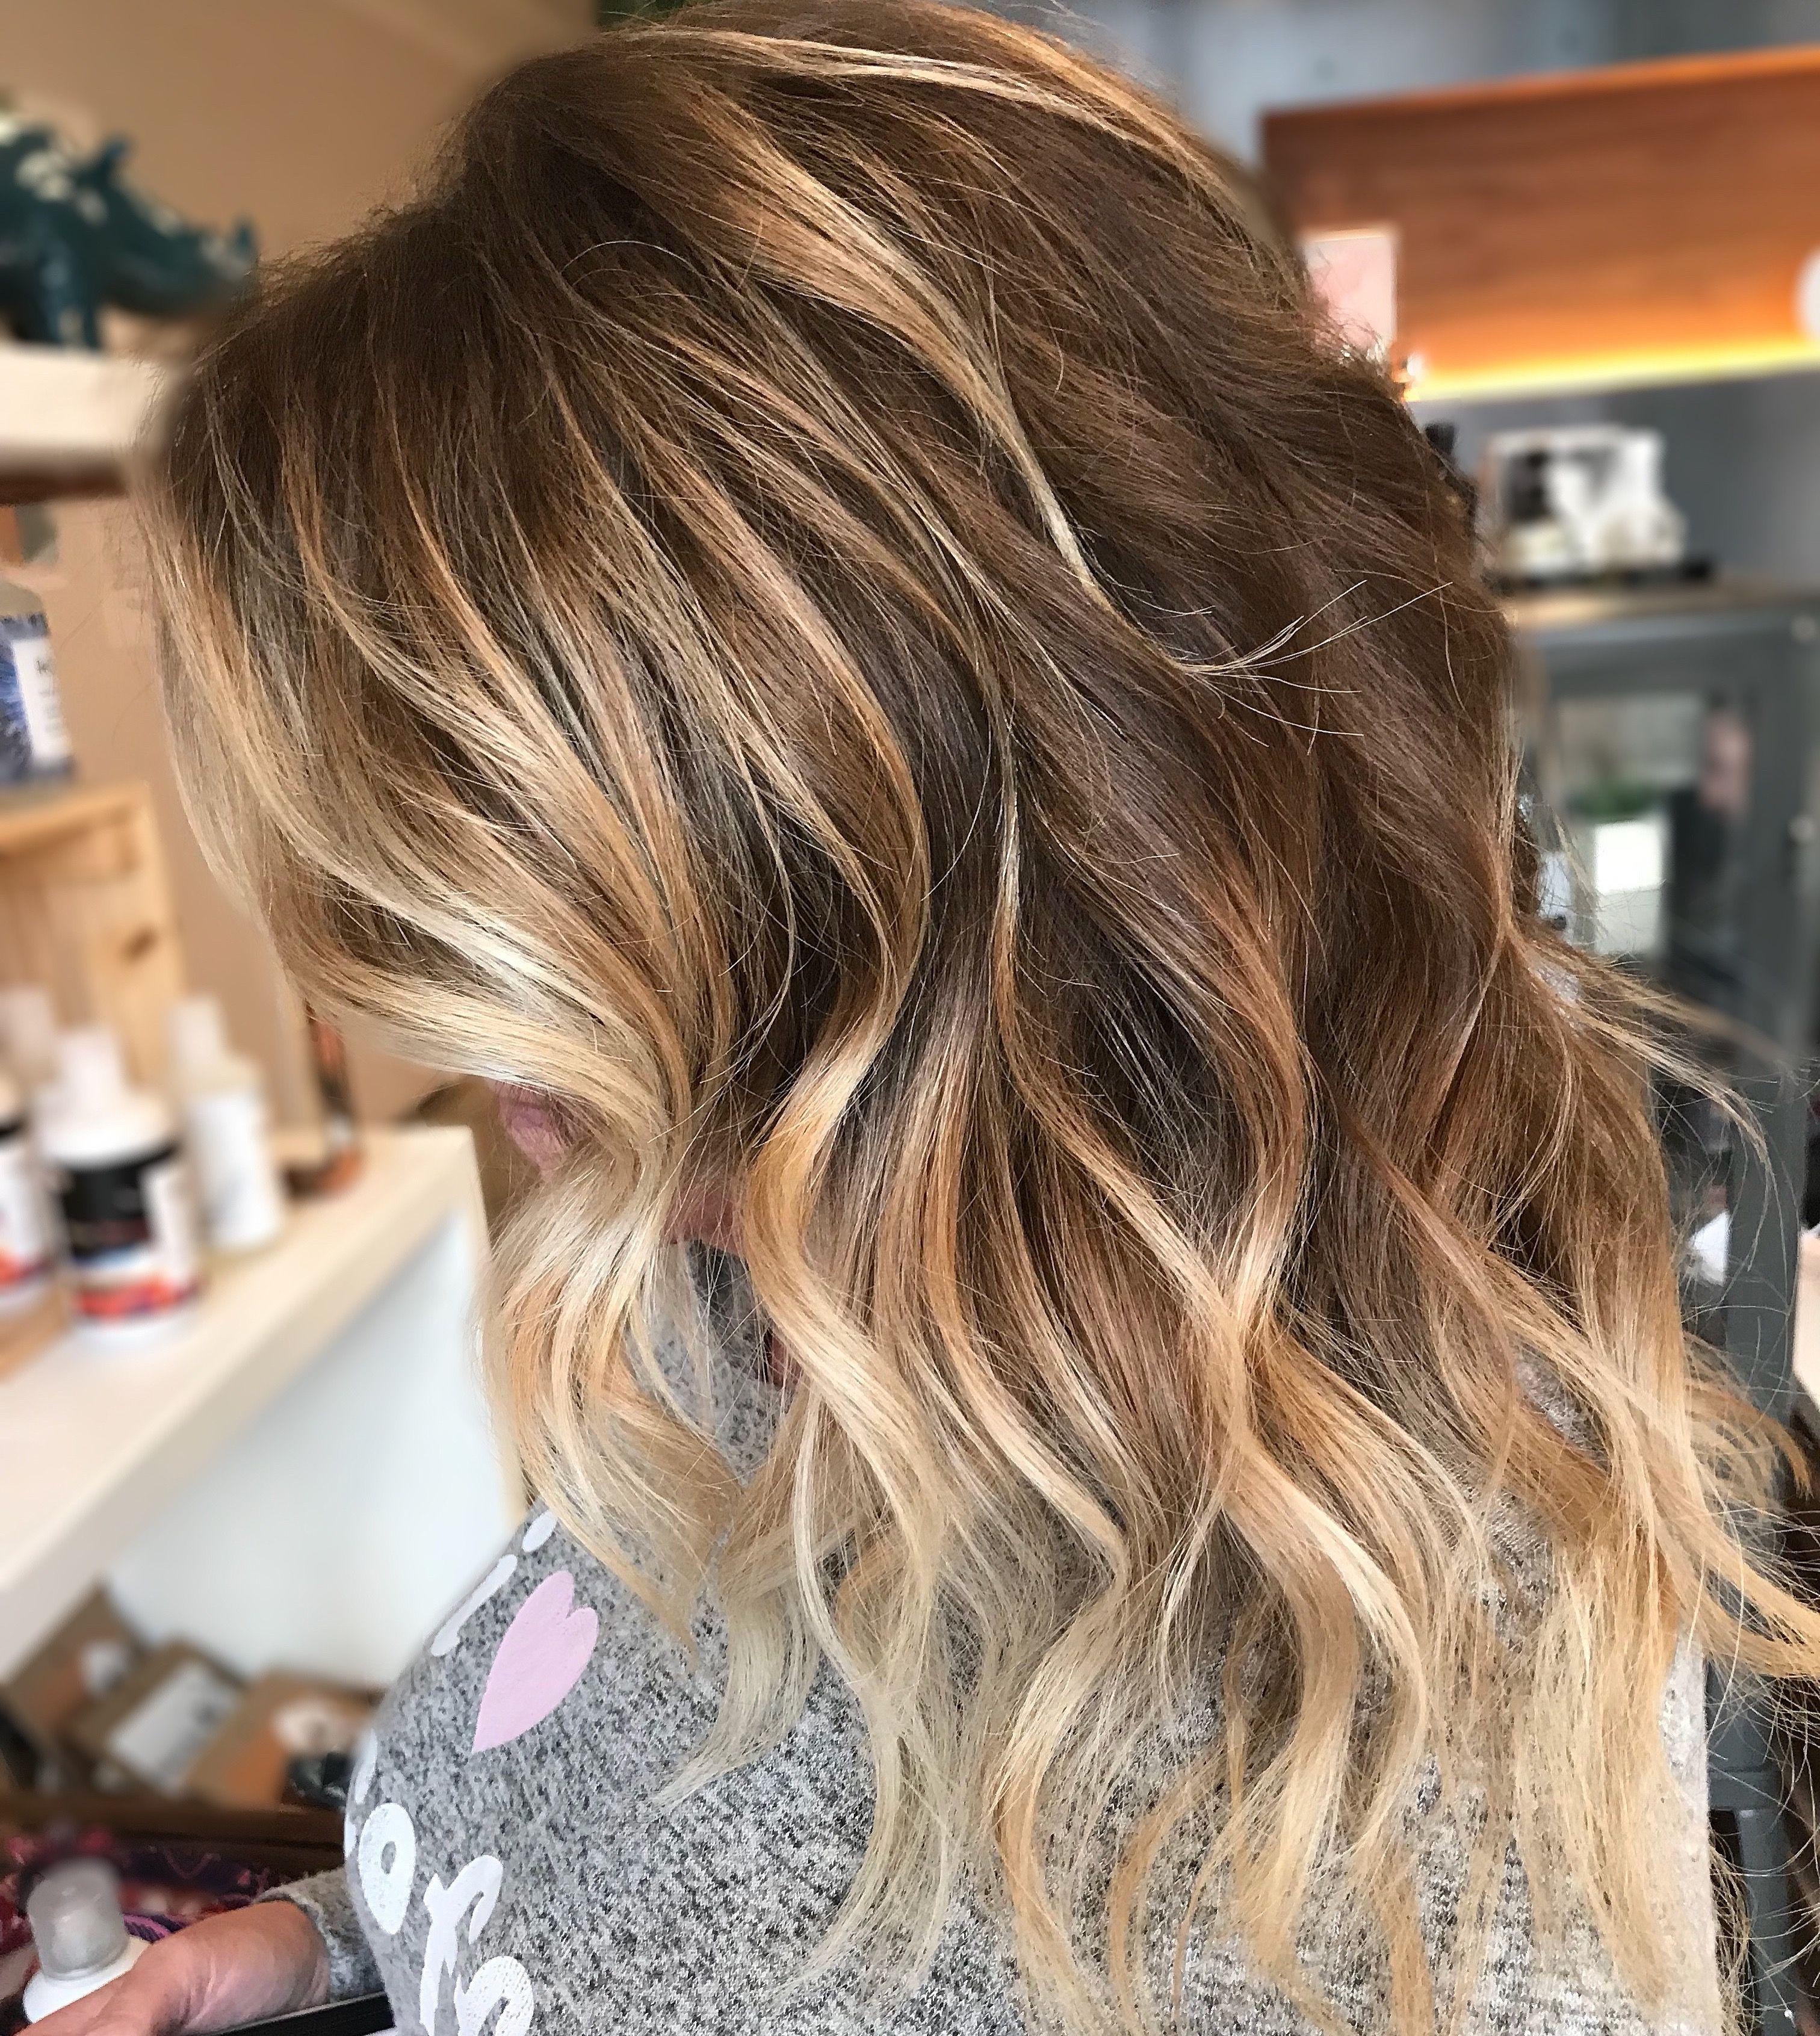 Golden balayage hair cuts and colors pinterest balayage